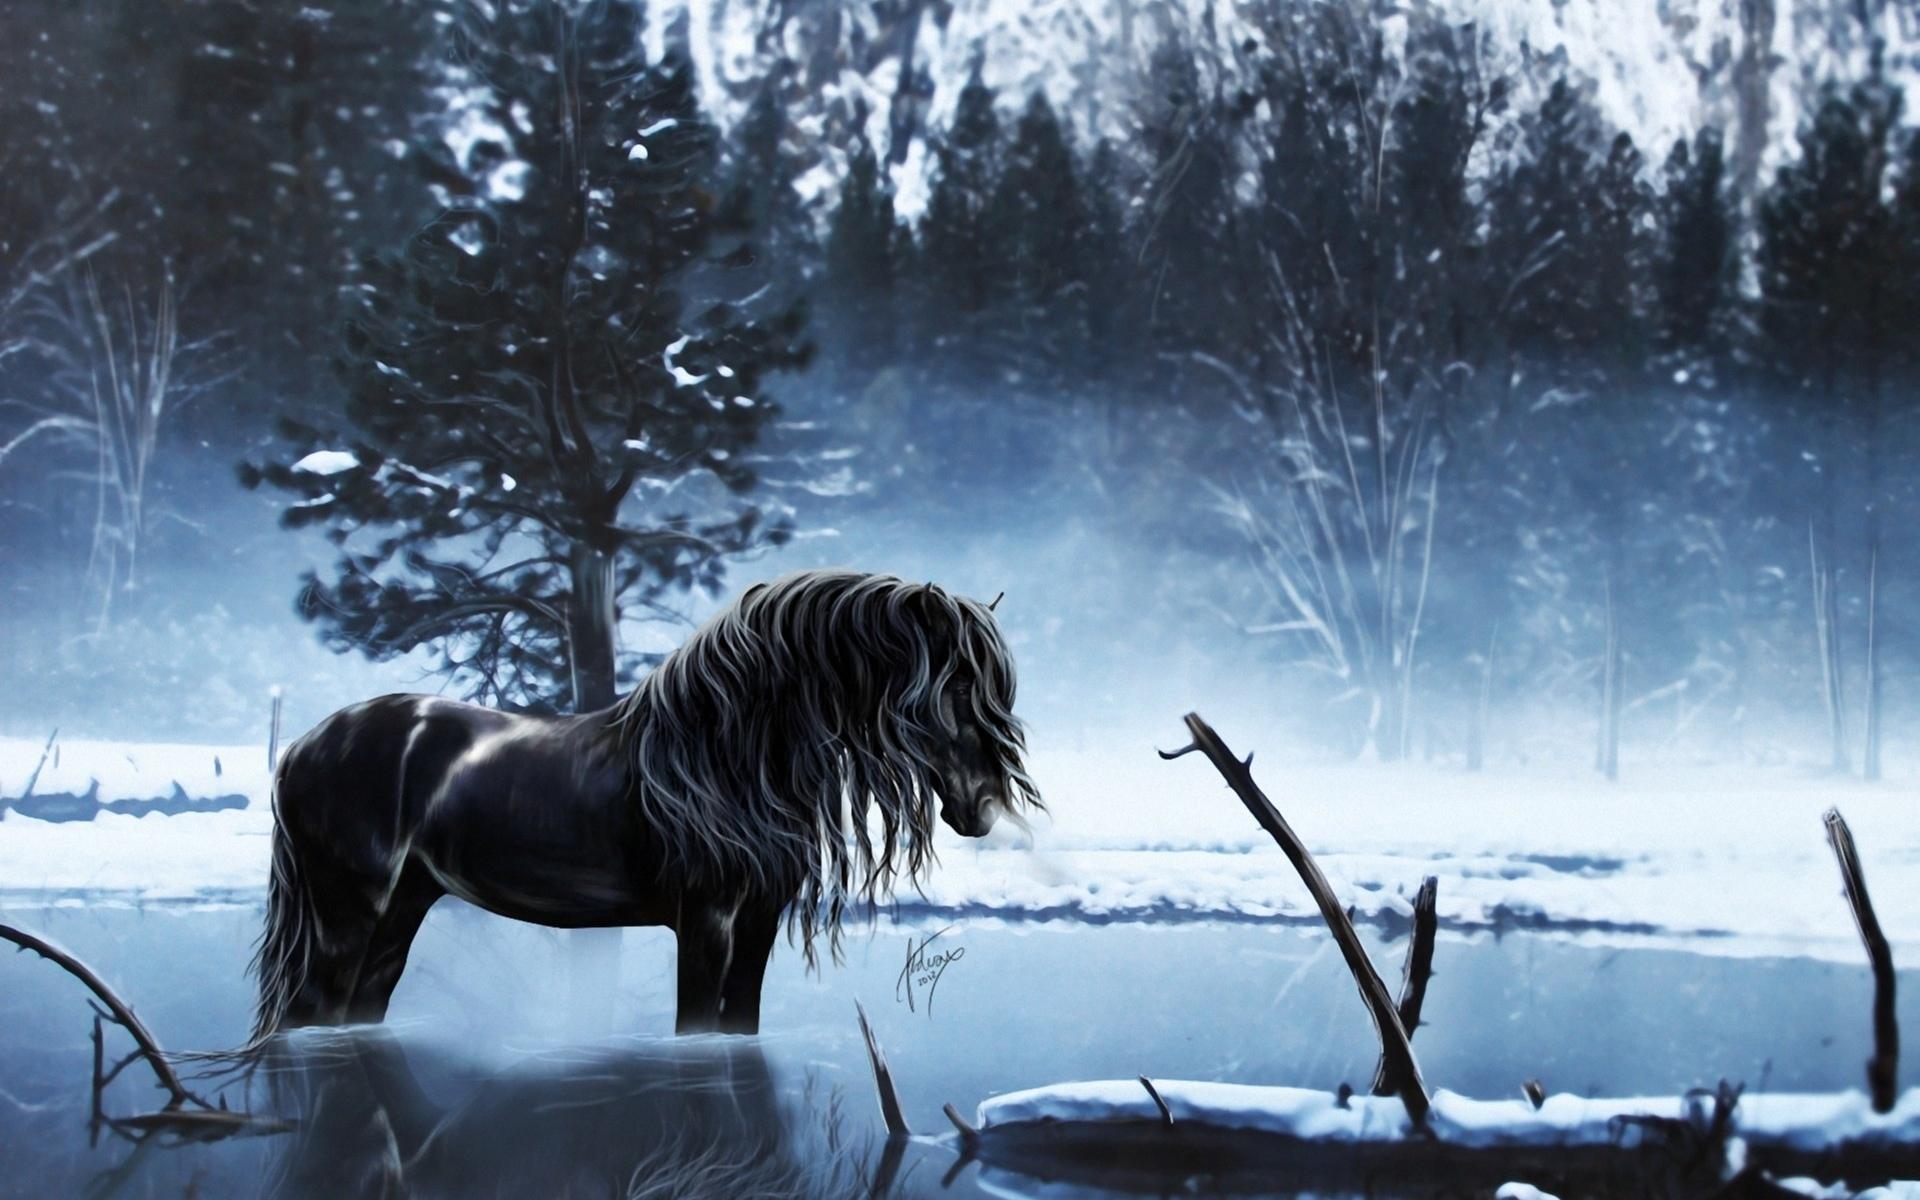 Horses fantasy art winter wallpaper 1920x1200 37159 WallpaperUP 1920x1200